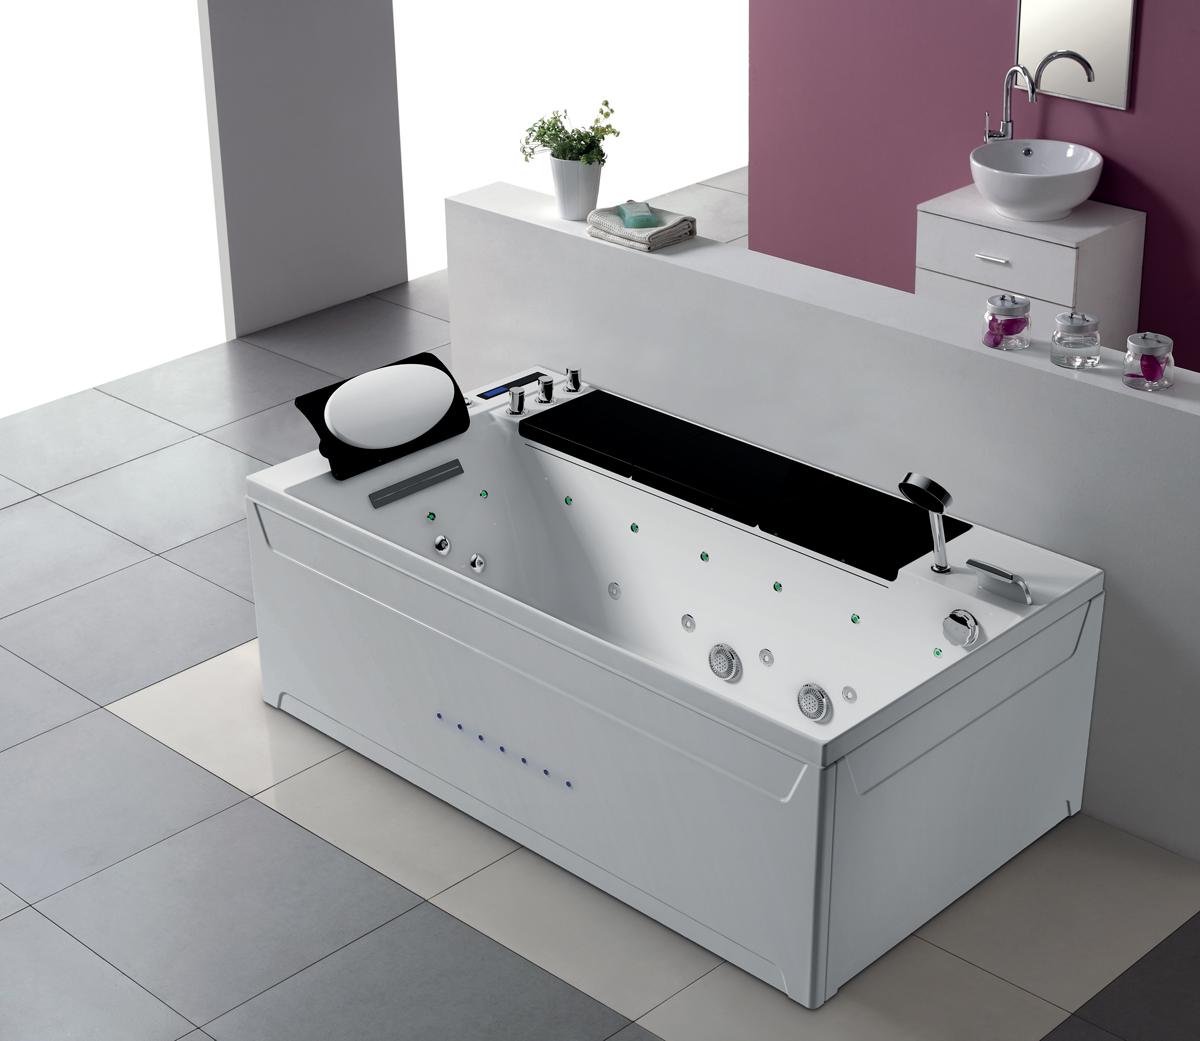 edle salottini sofagarnitur 3 2 1 hampton leder polstergarnitur uvp ebay. Black Bedroom Furniture Sets. Home Design Ideas